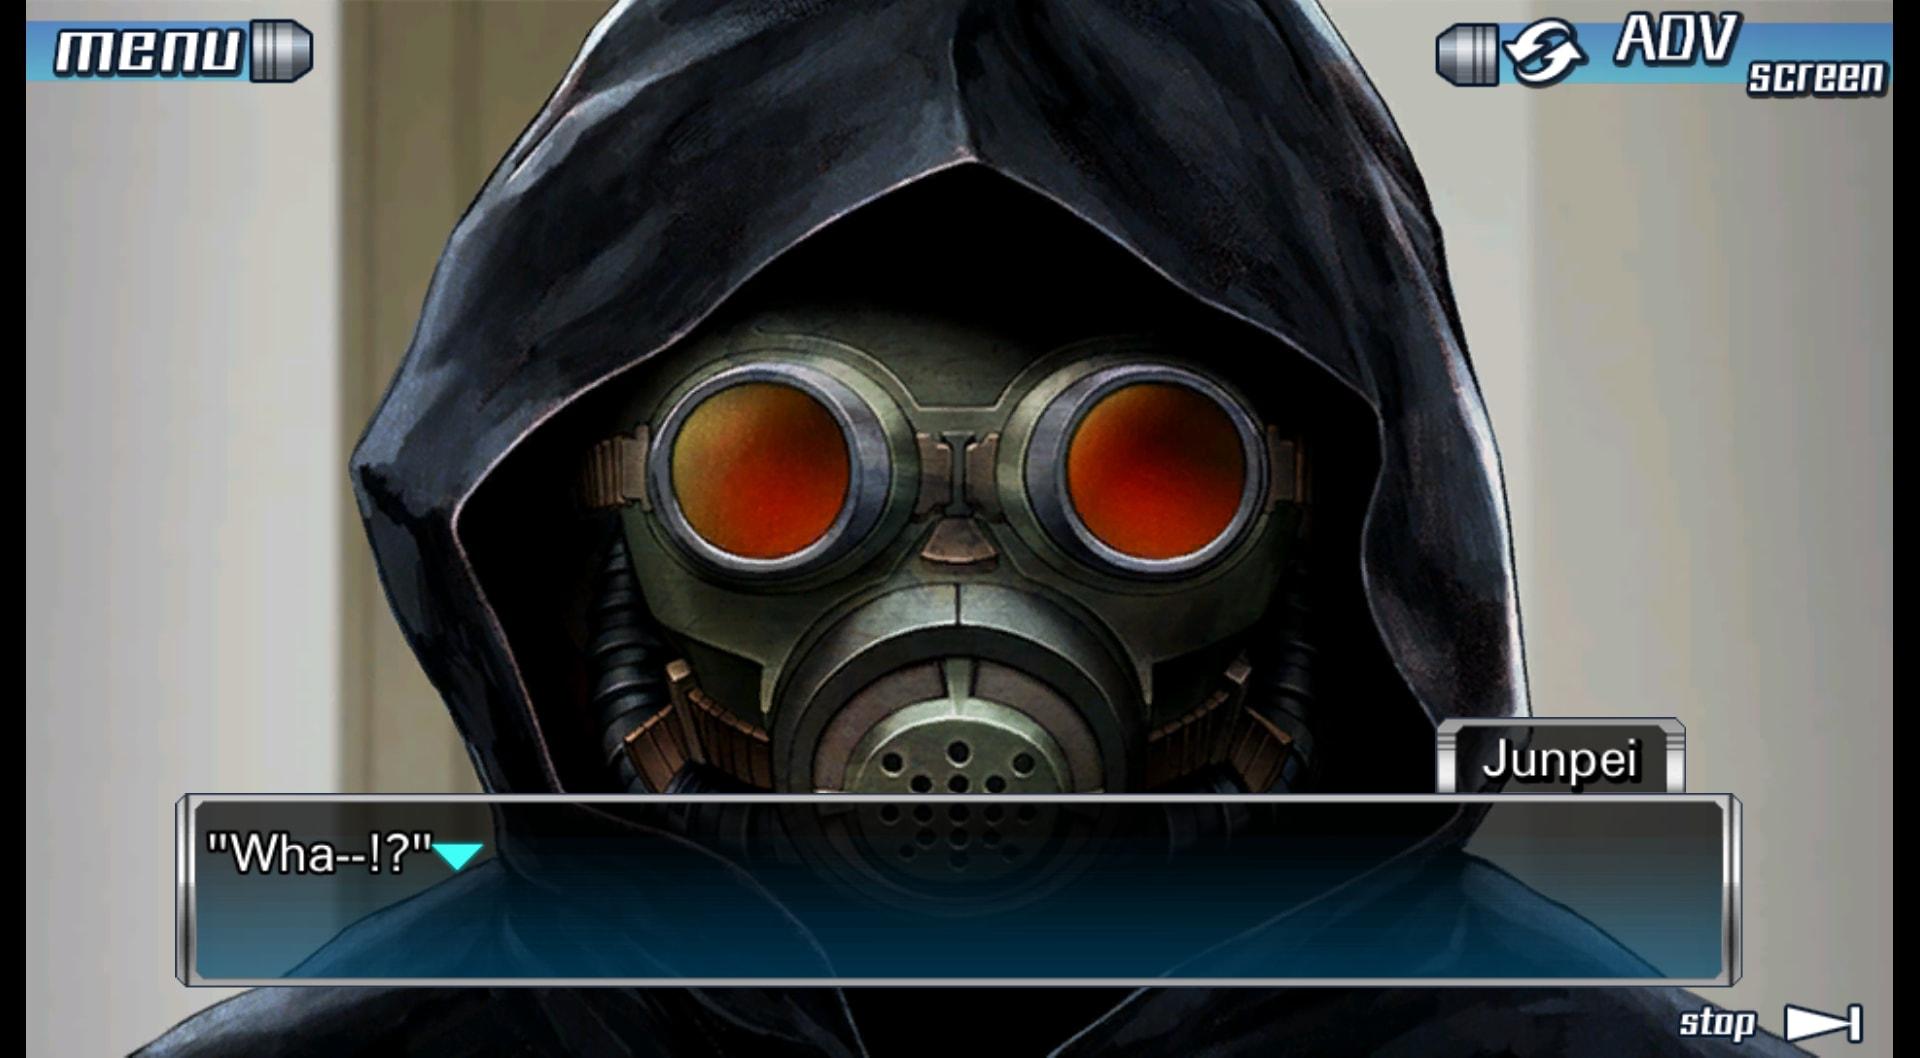 Kompilace Zero Escape: The Nonary Games oznámena pro PS4, Vitu a PC 133027